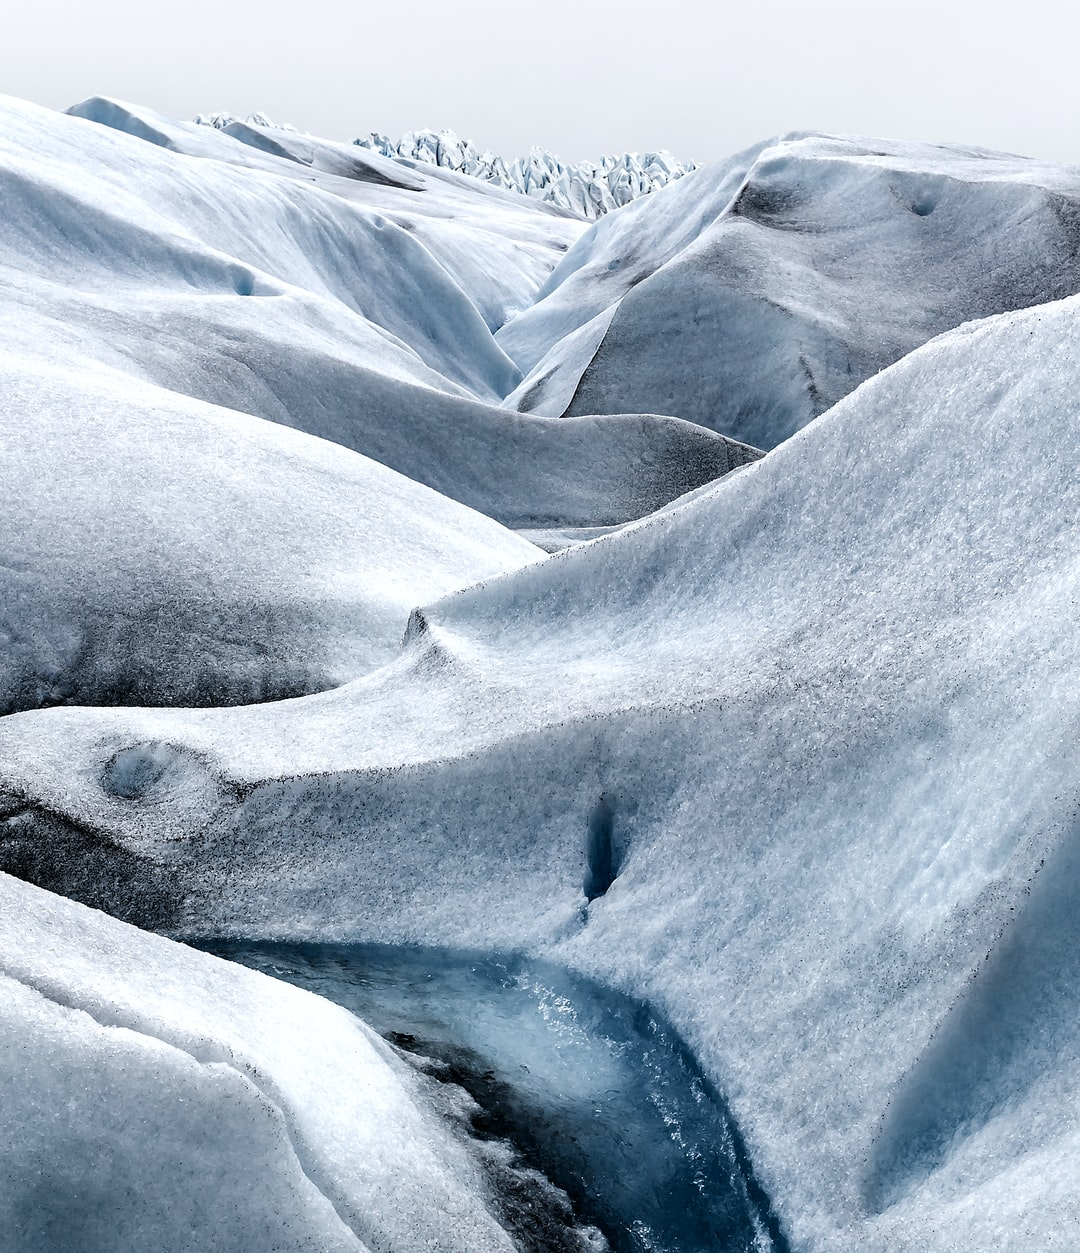 Torres del Paine: Un lugar al sur de Chile